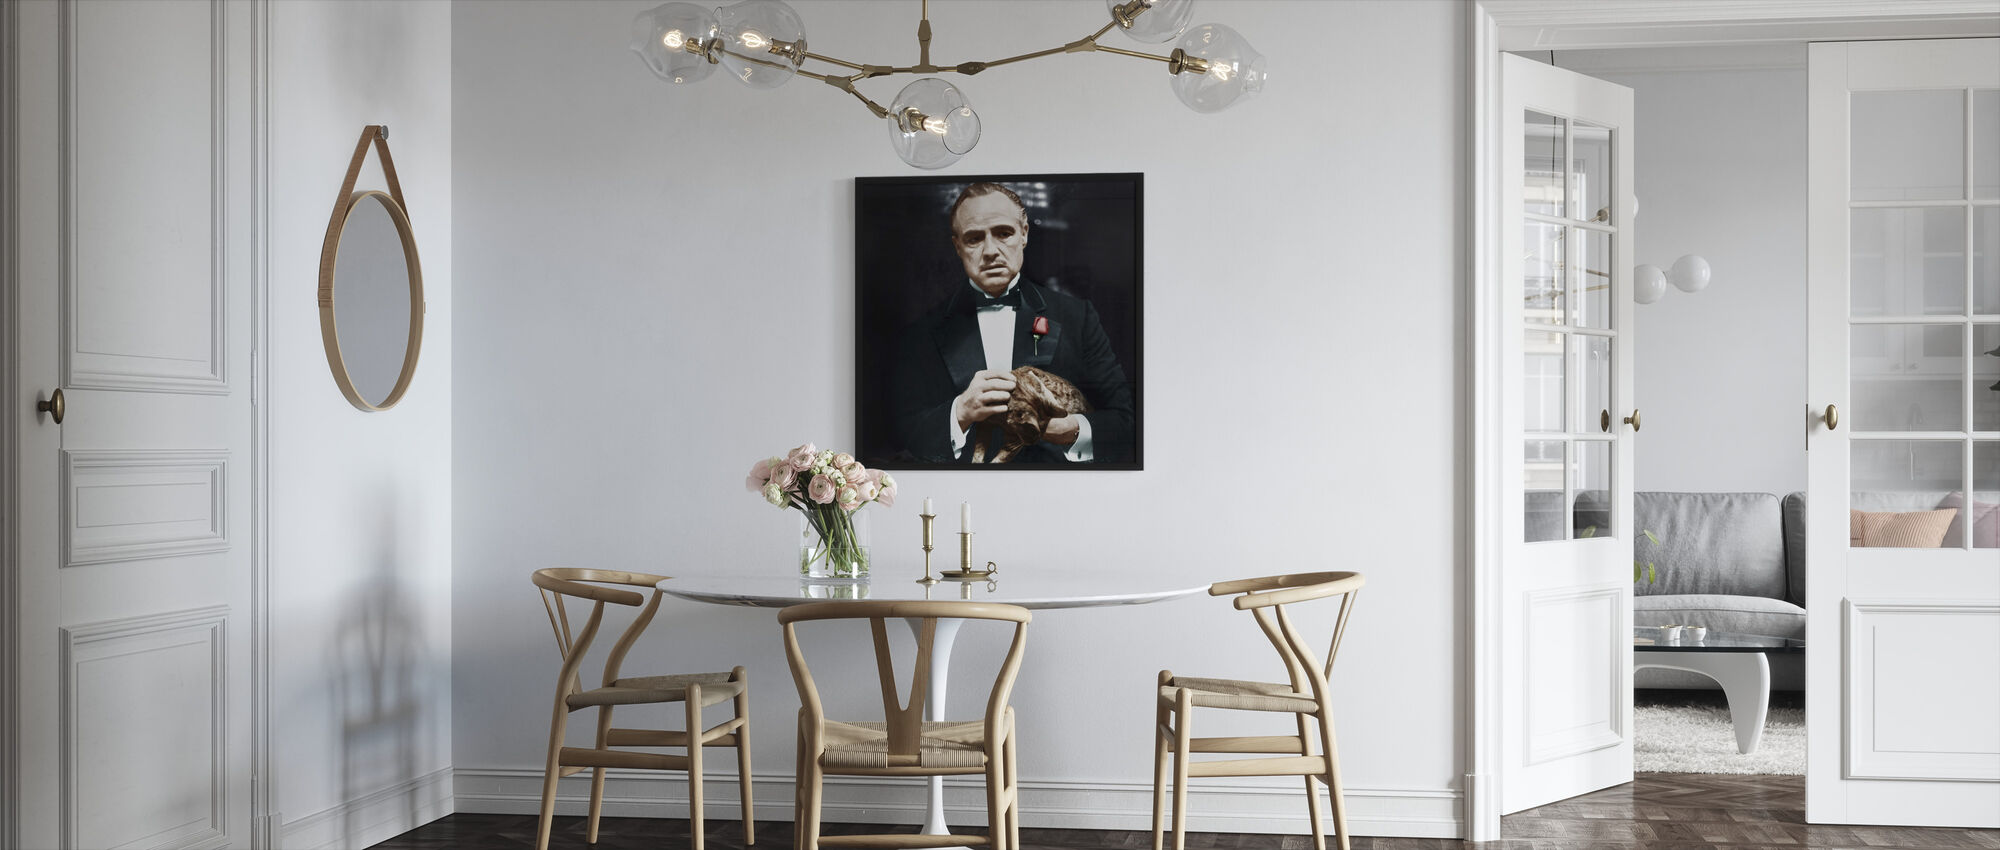 The Godfather - Cat - Framed print - Kitchen